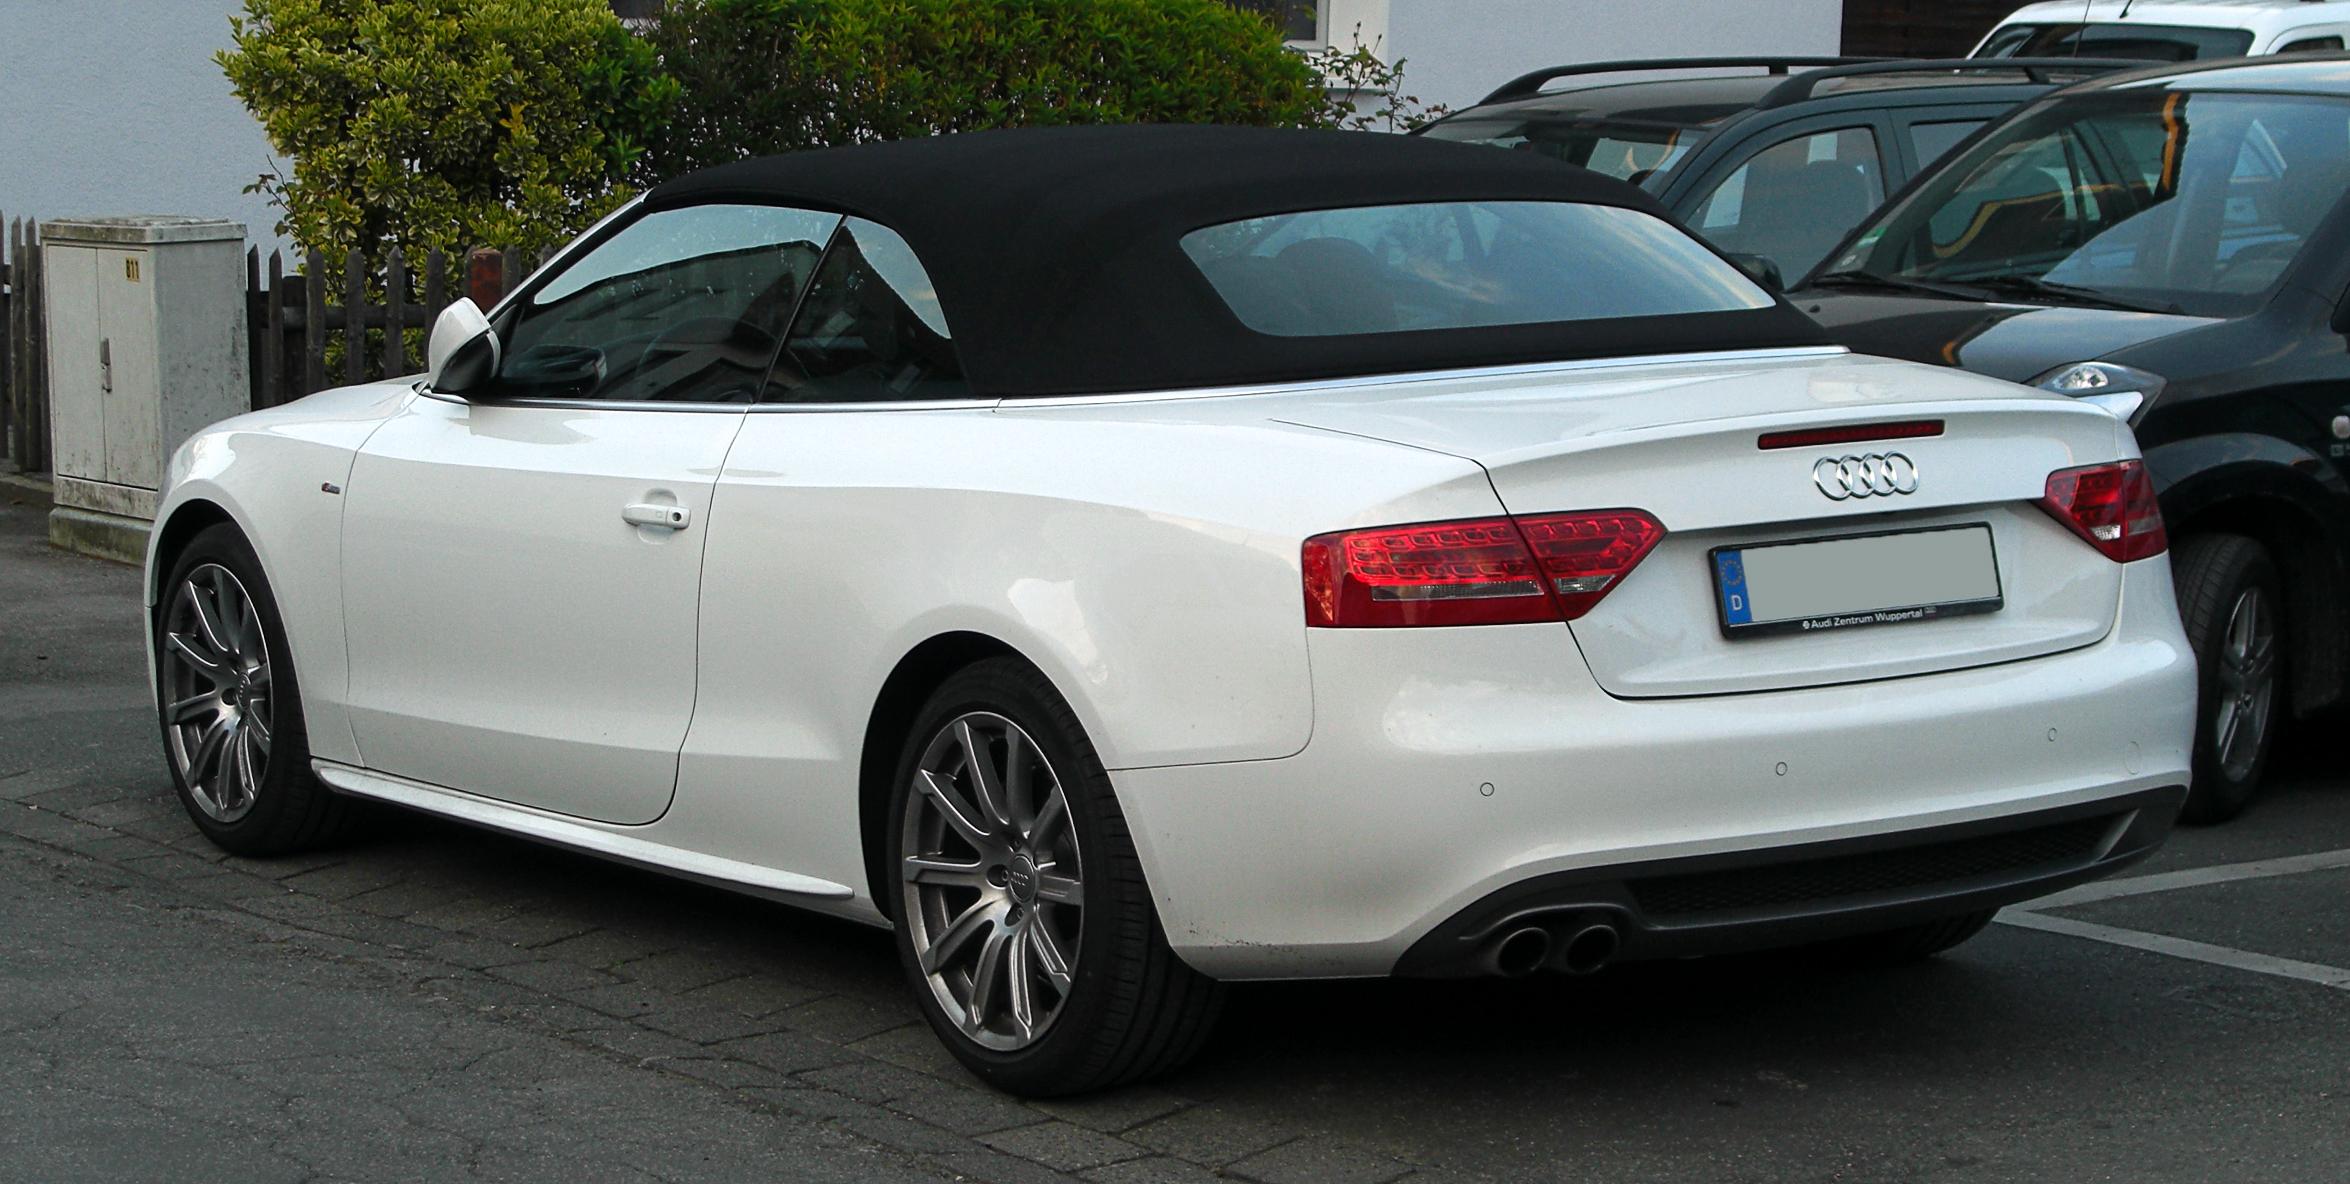 File:Audi A5 Cabriolet 1.8 TFSI S-line – Heckansicht, 15. April 2011 ...